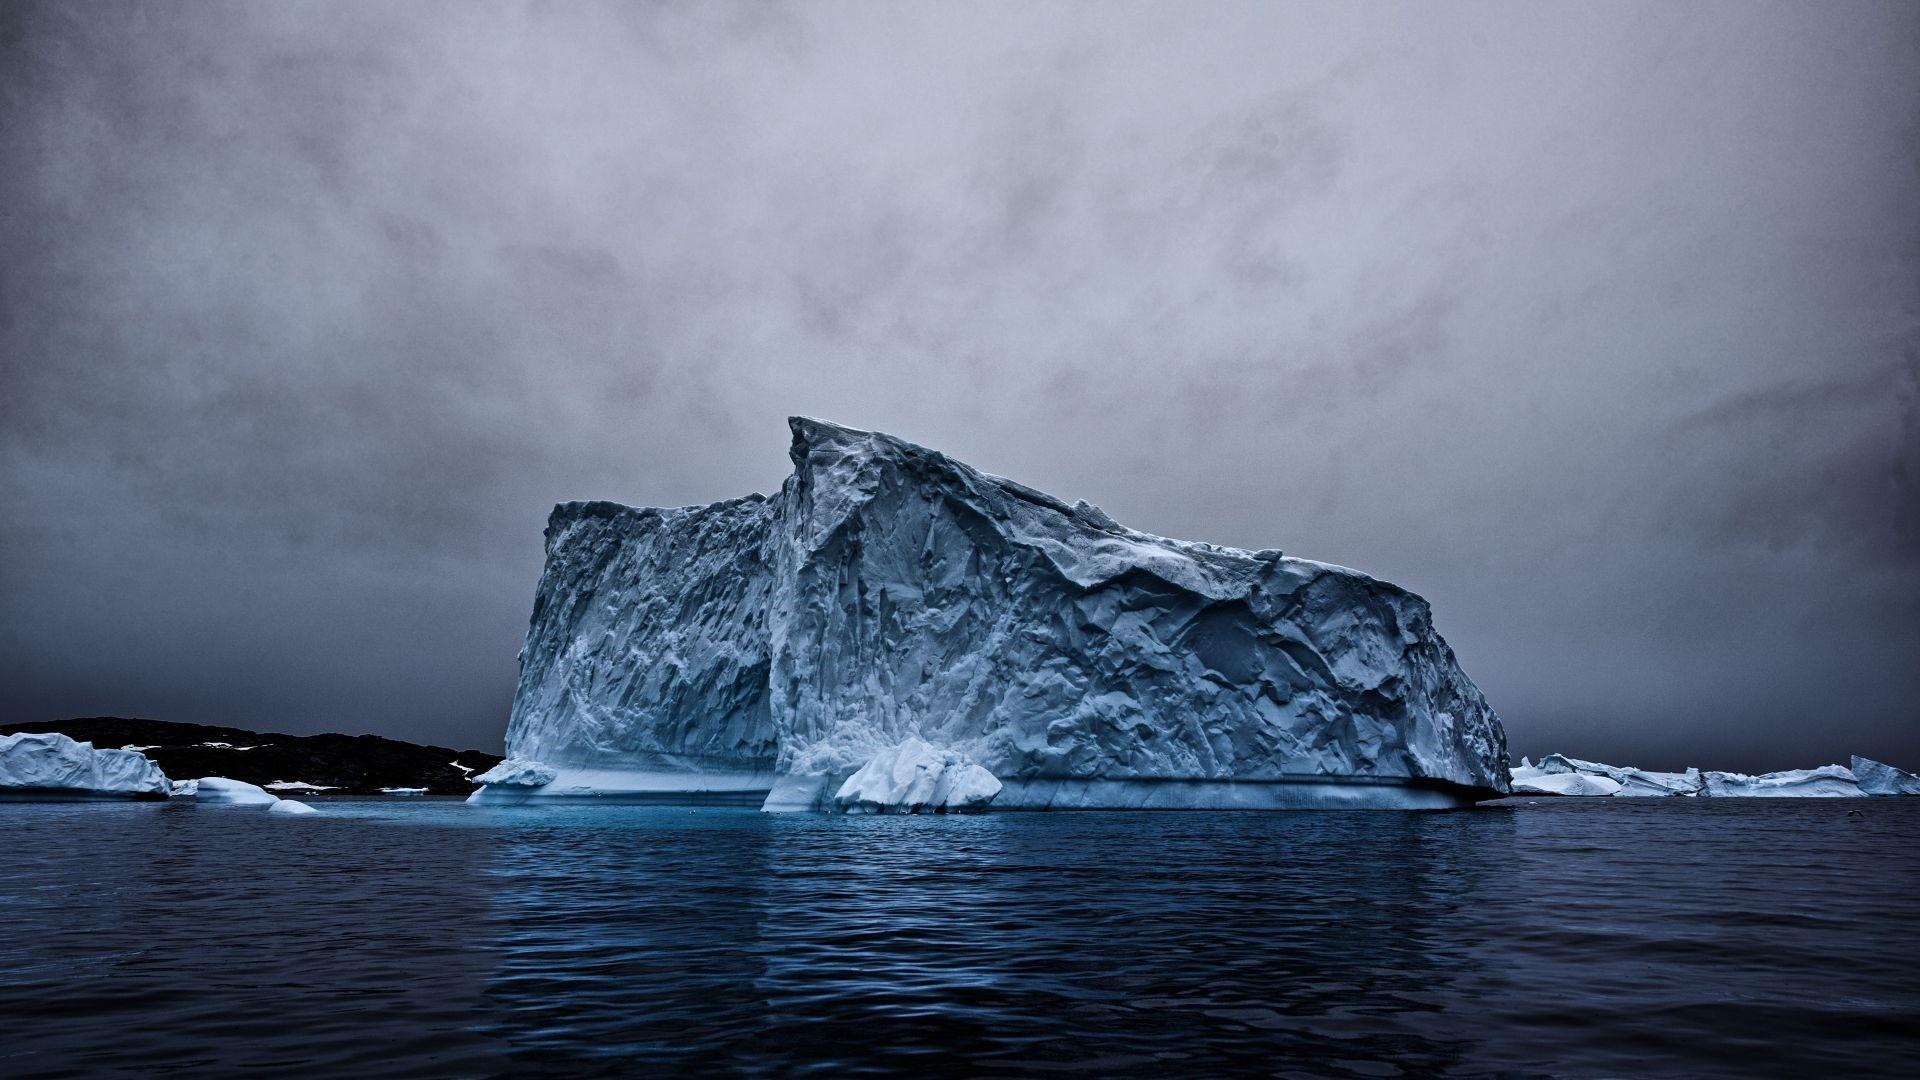 Iceberg hd wallpaper download